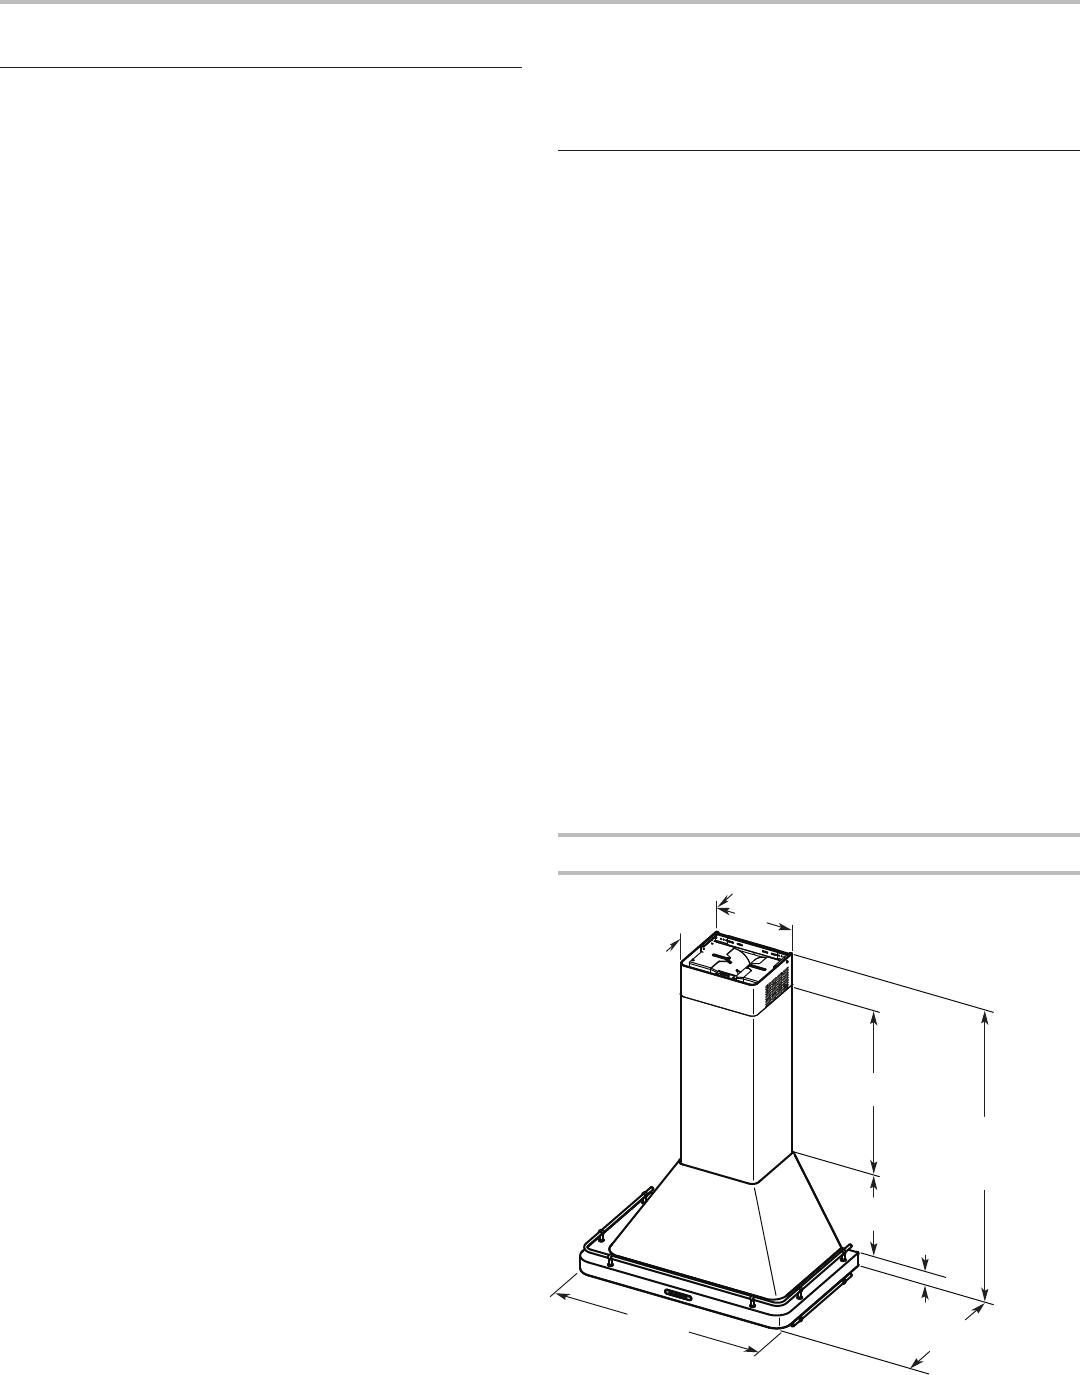 ikea ihw61uc0fs user manual hood ventilation professional manuals Light Wiring Diagrams Multiple Lights 5